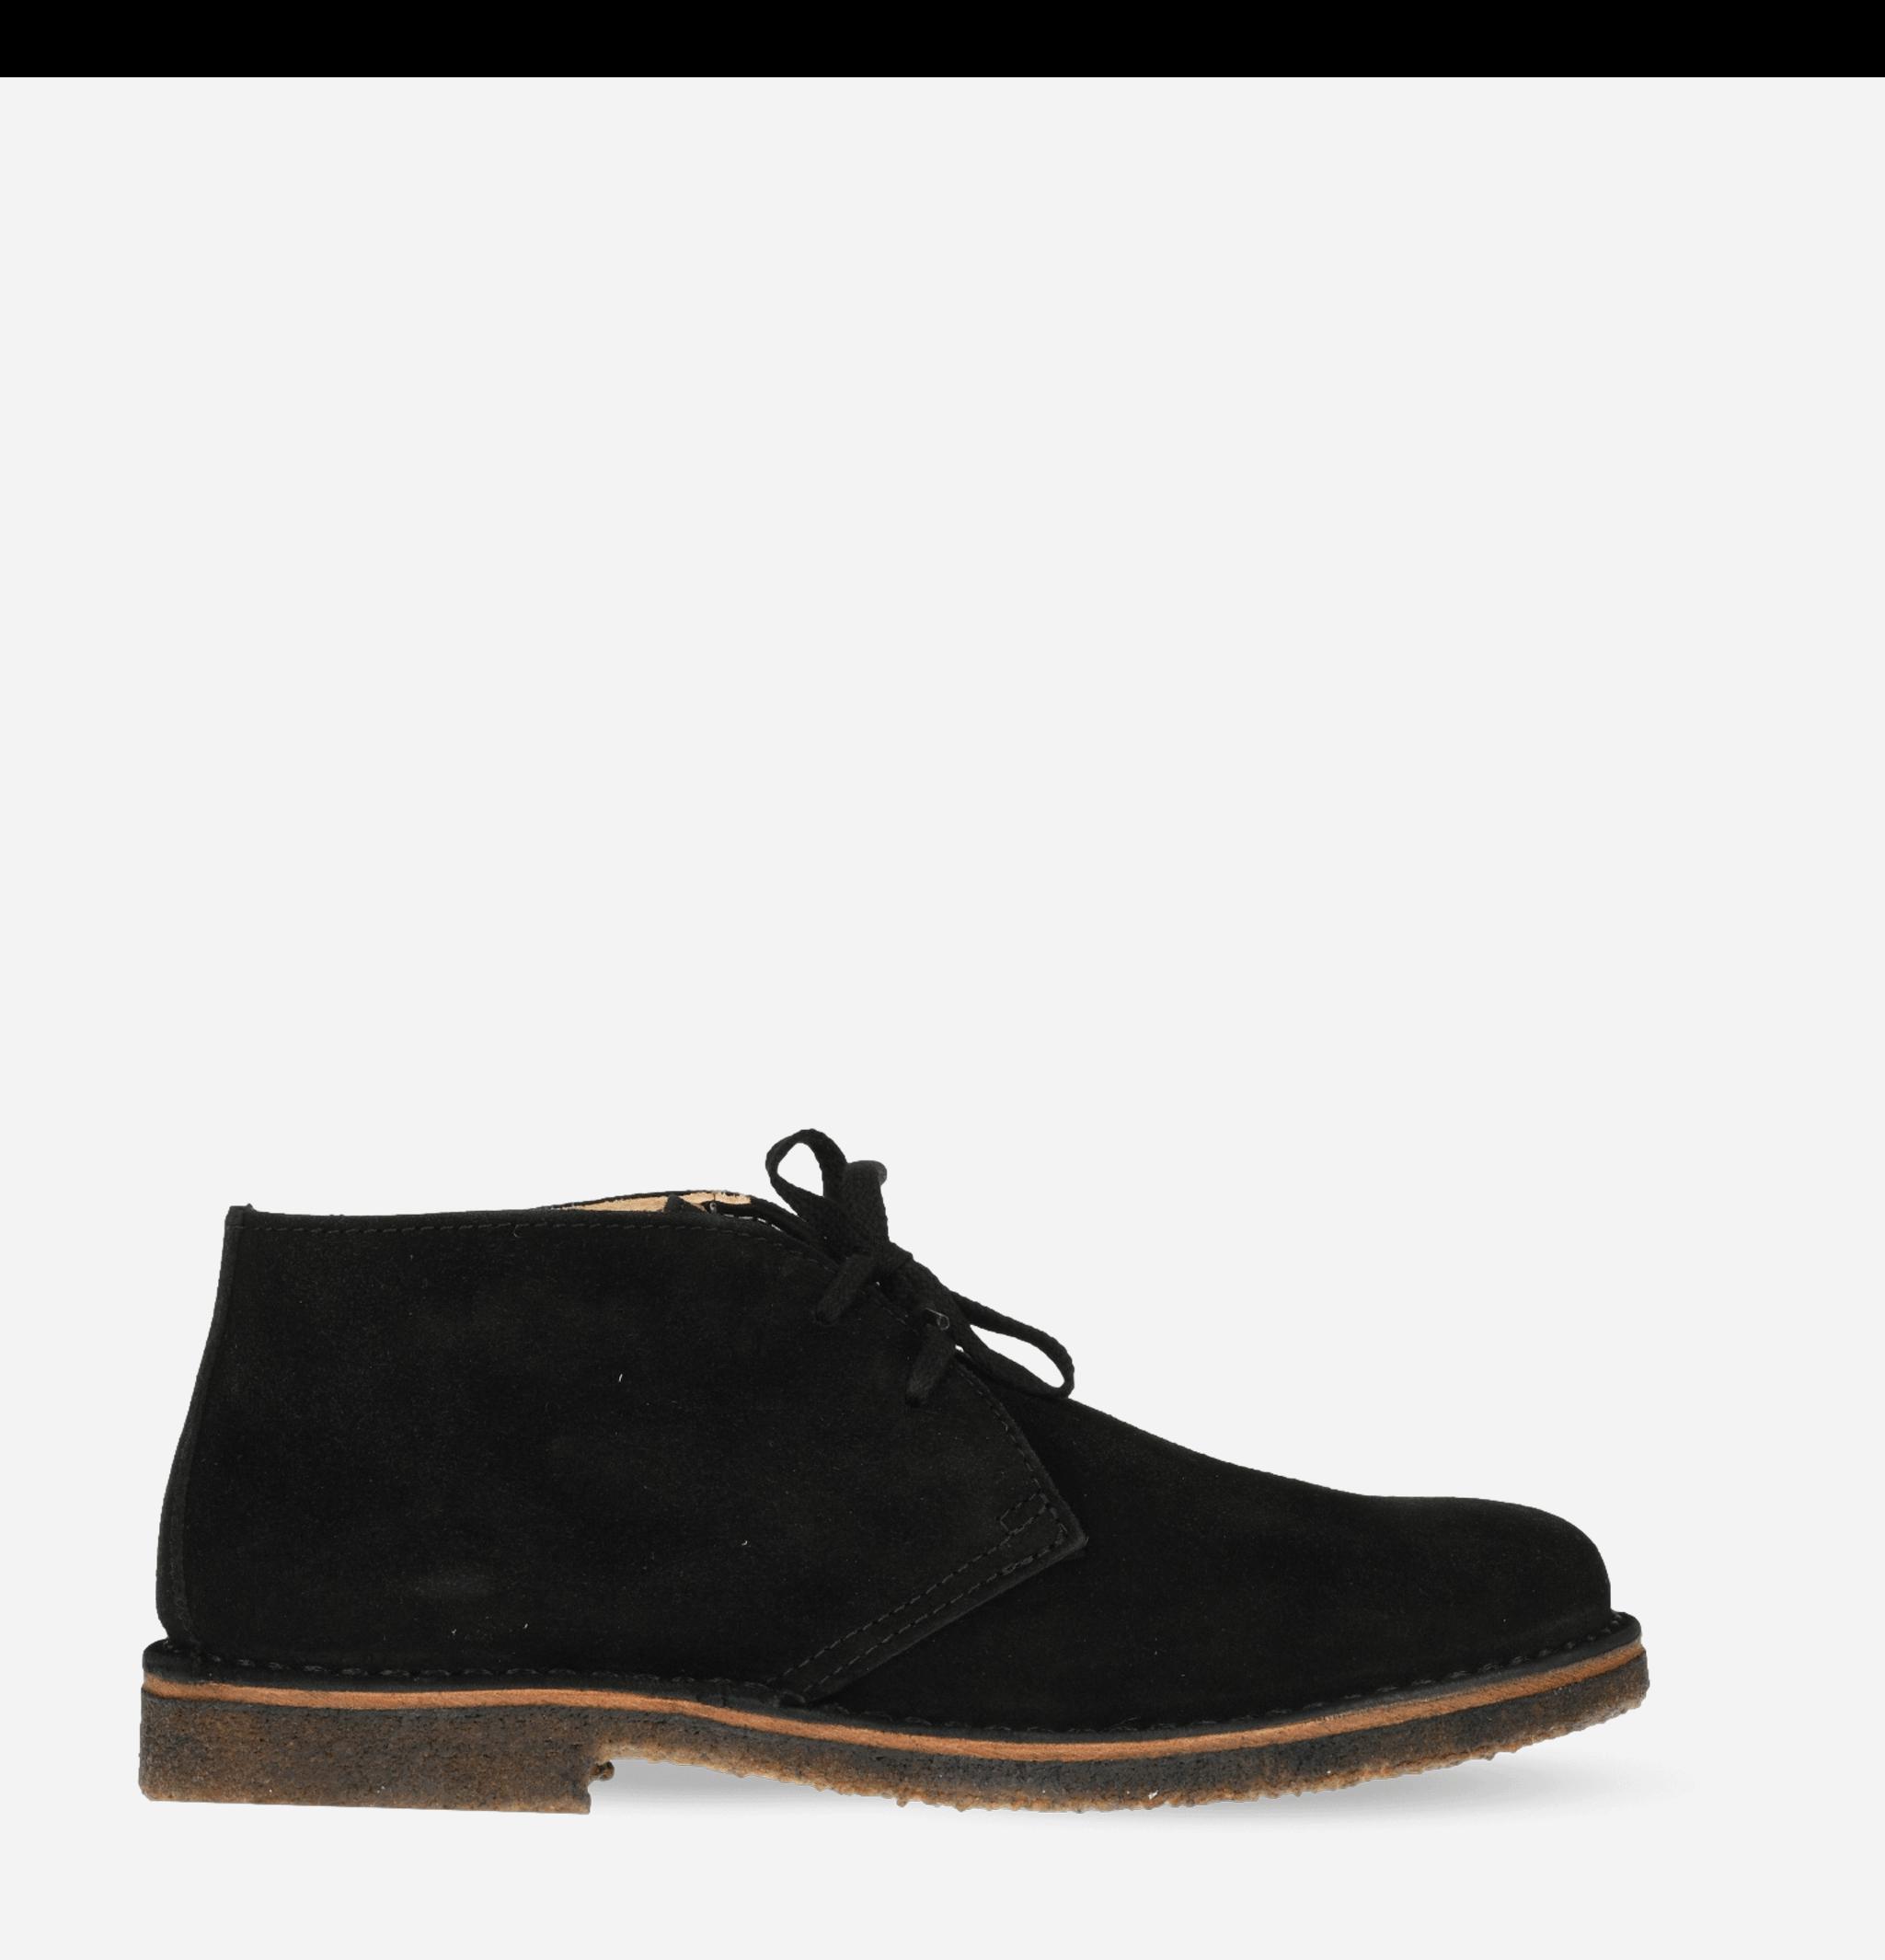 Greenflex Boots Black